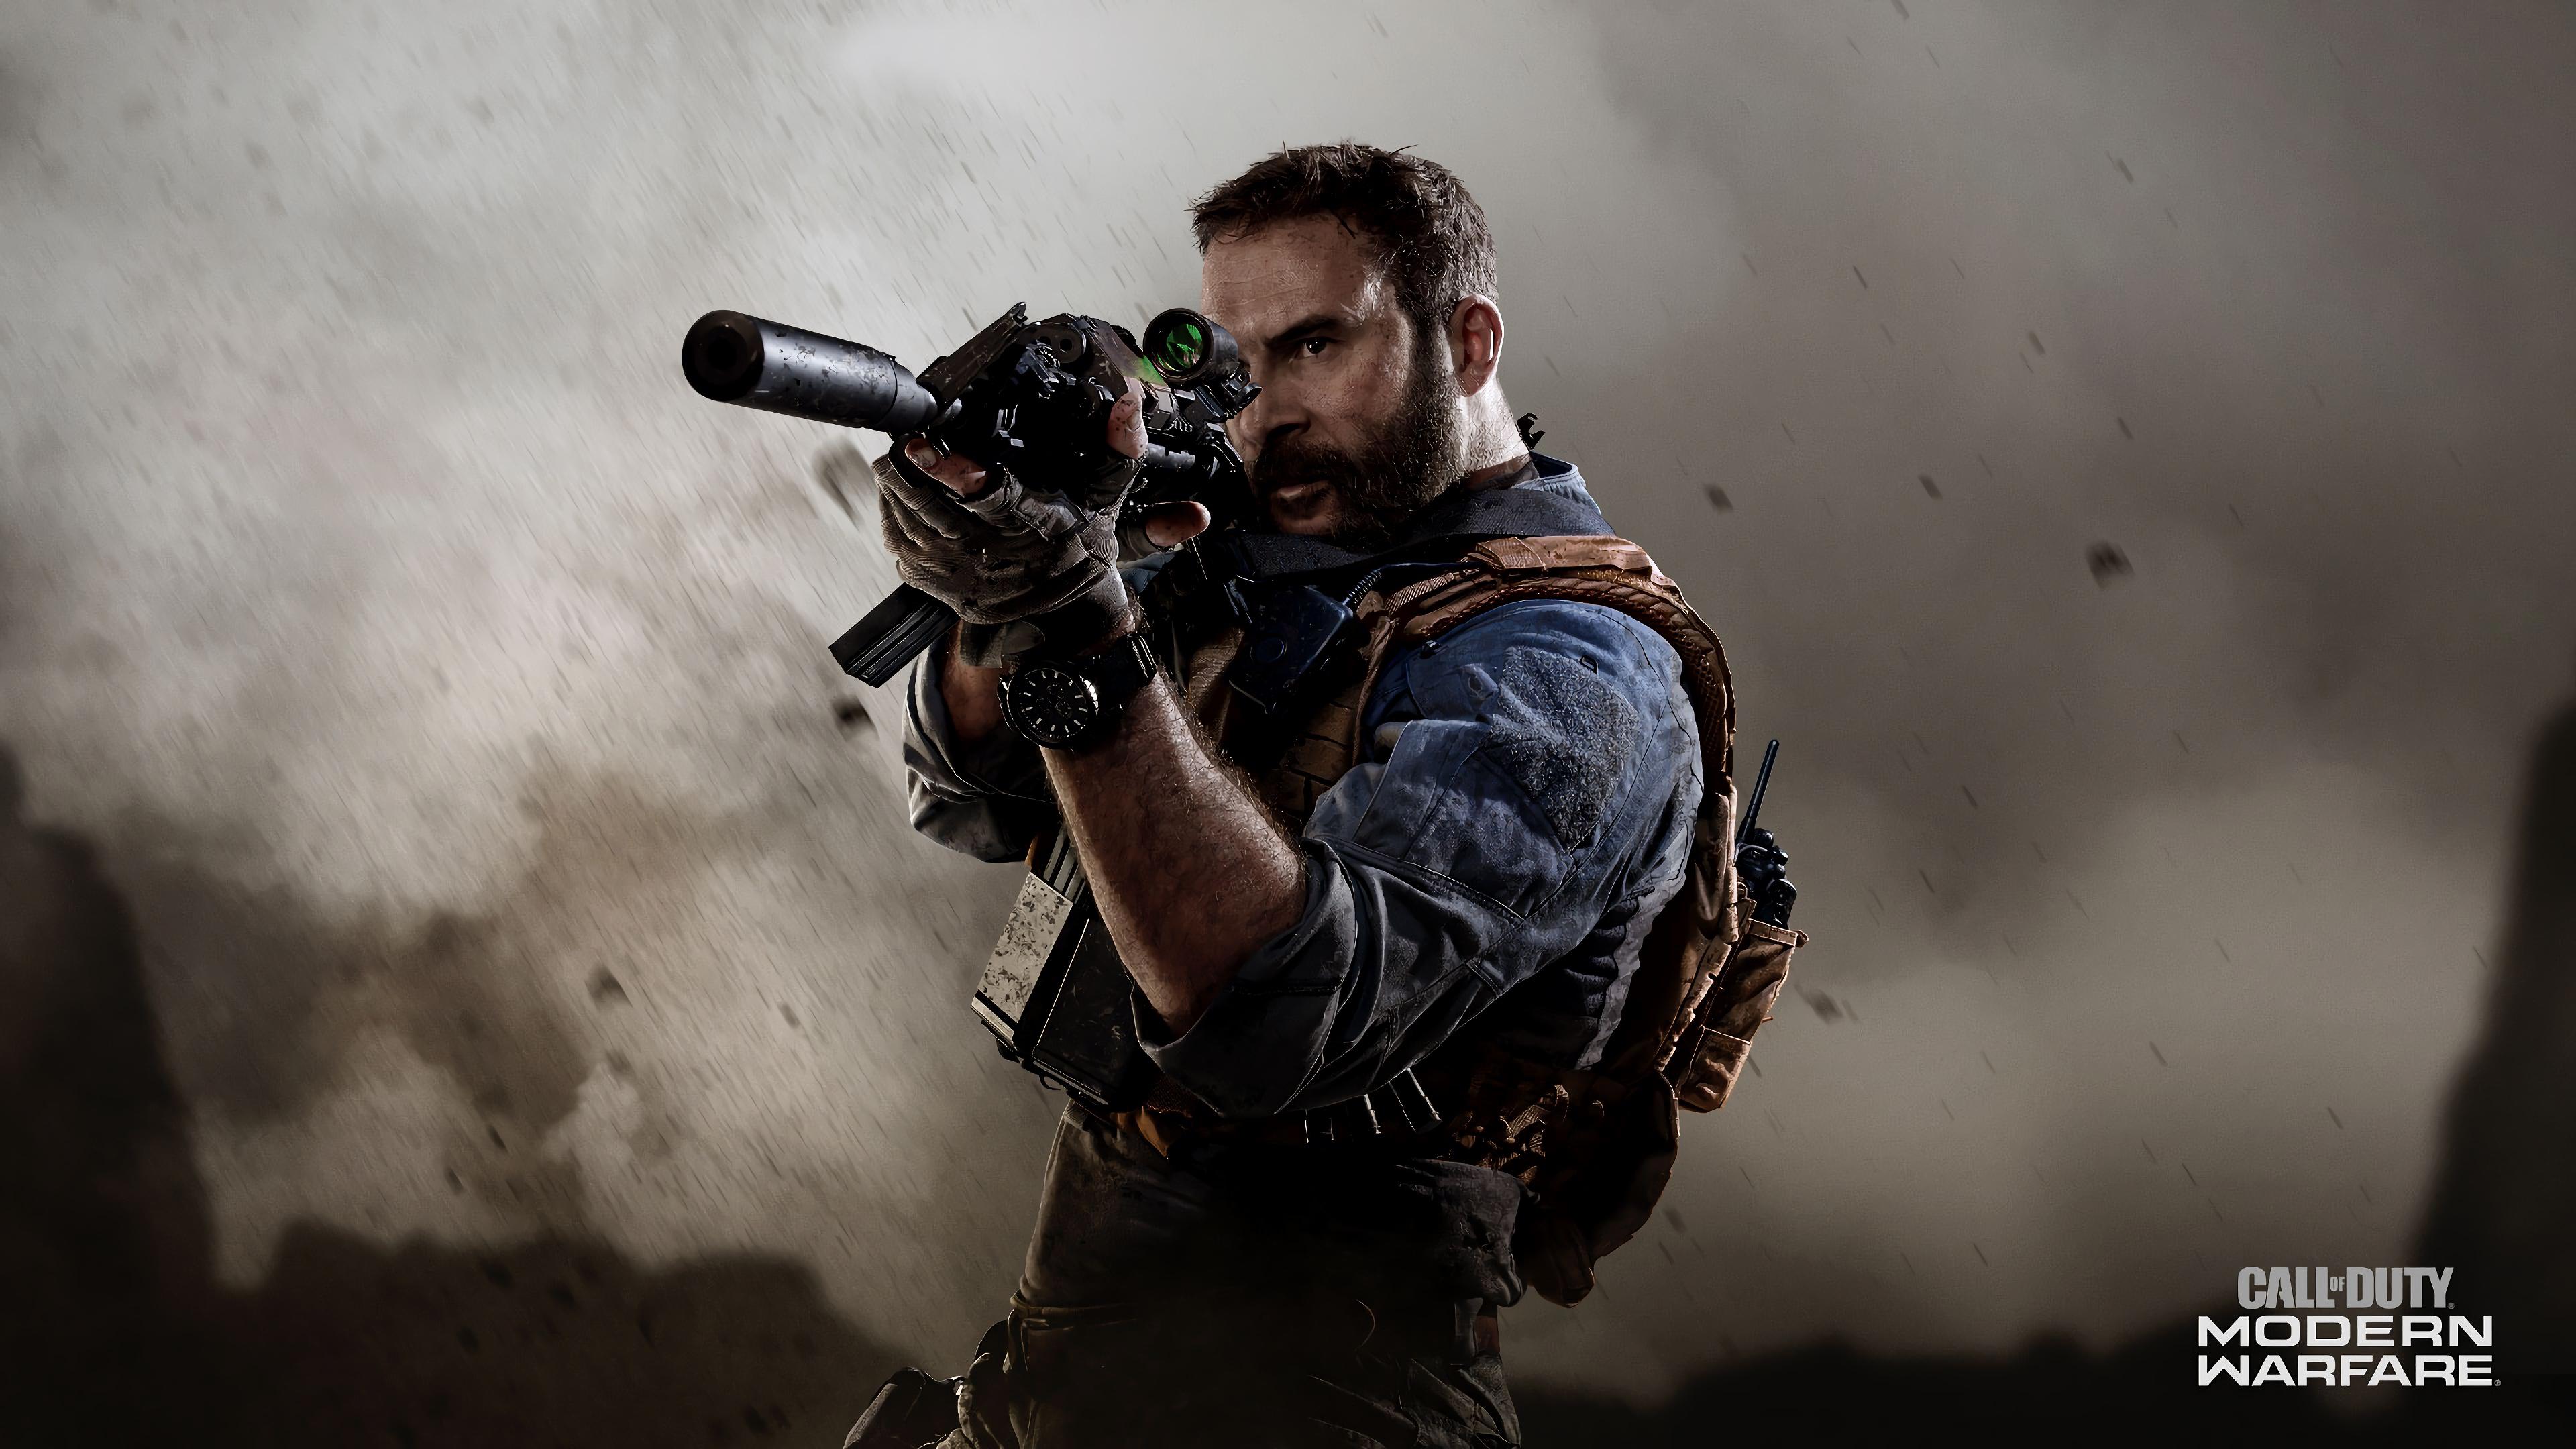 Call Of Duty Modern Warfare Captain Price 4k Wallpaper 9